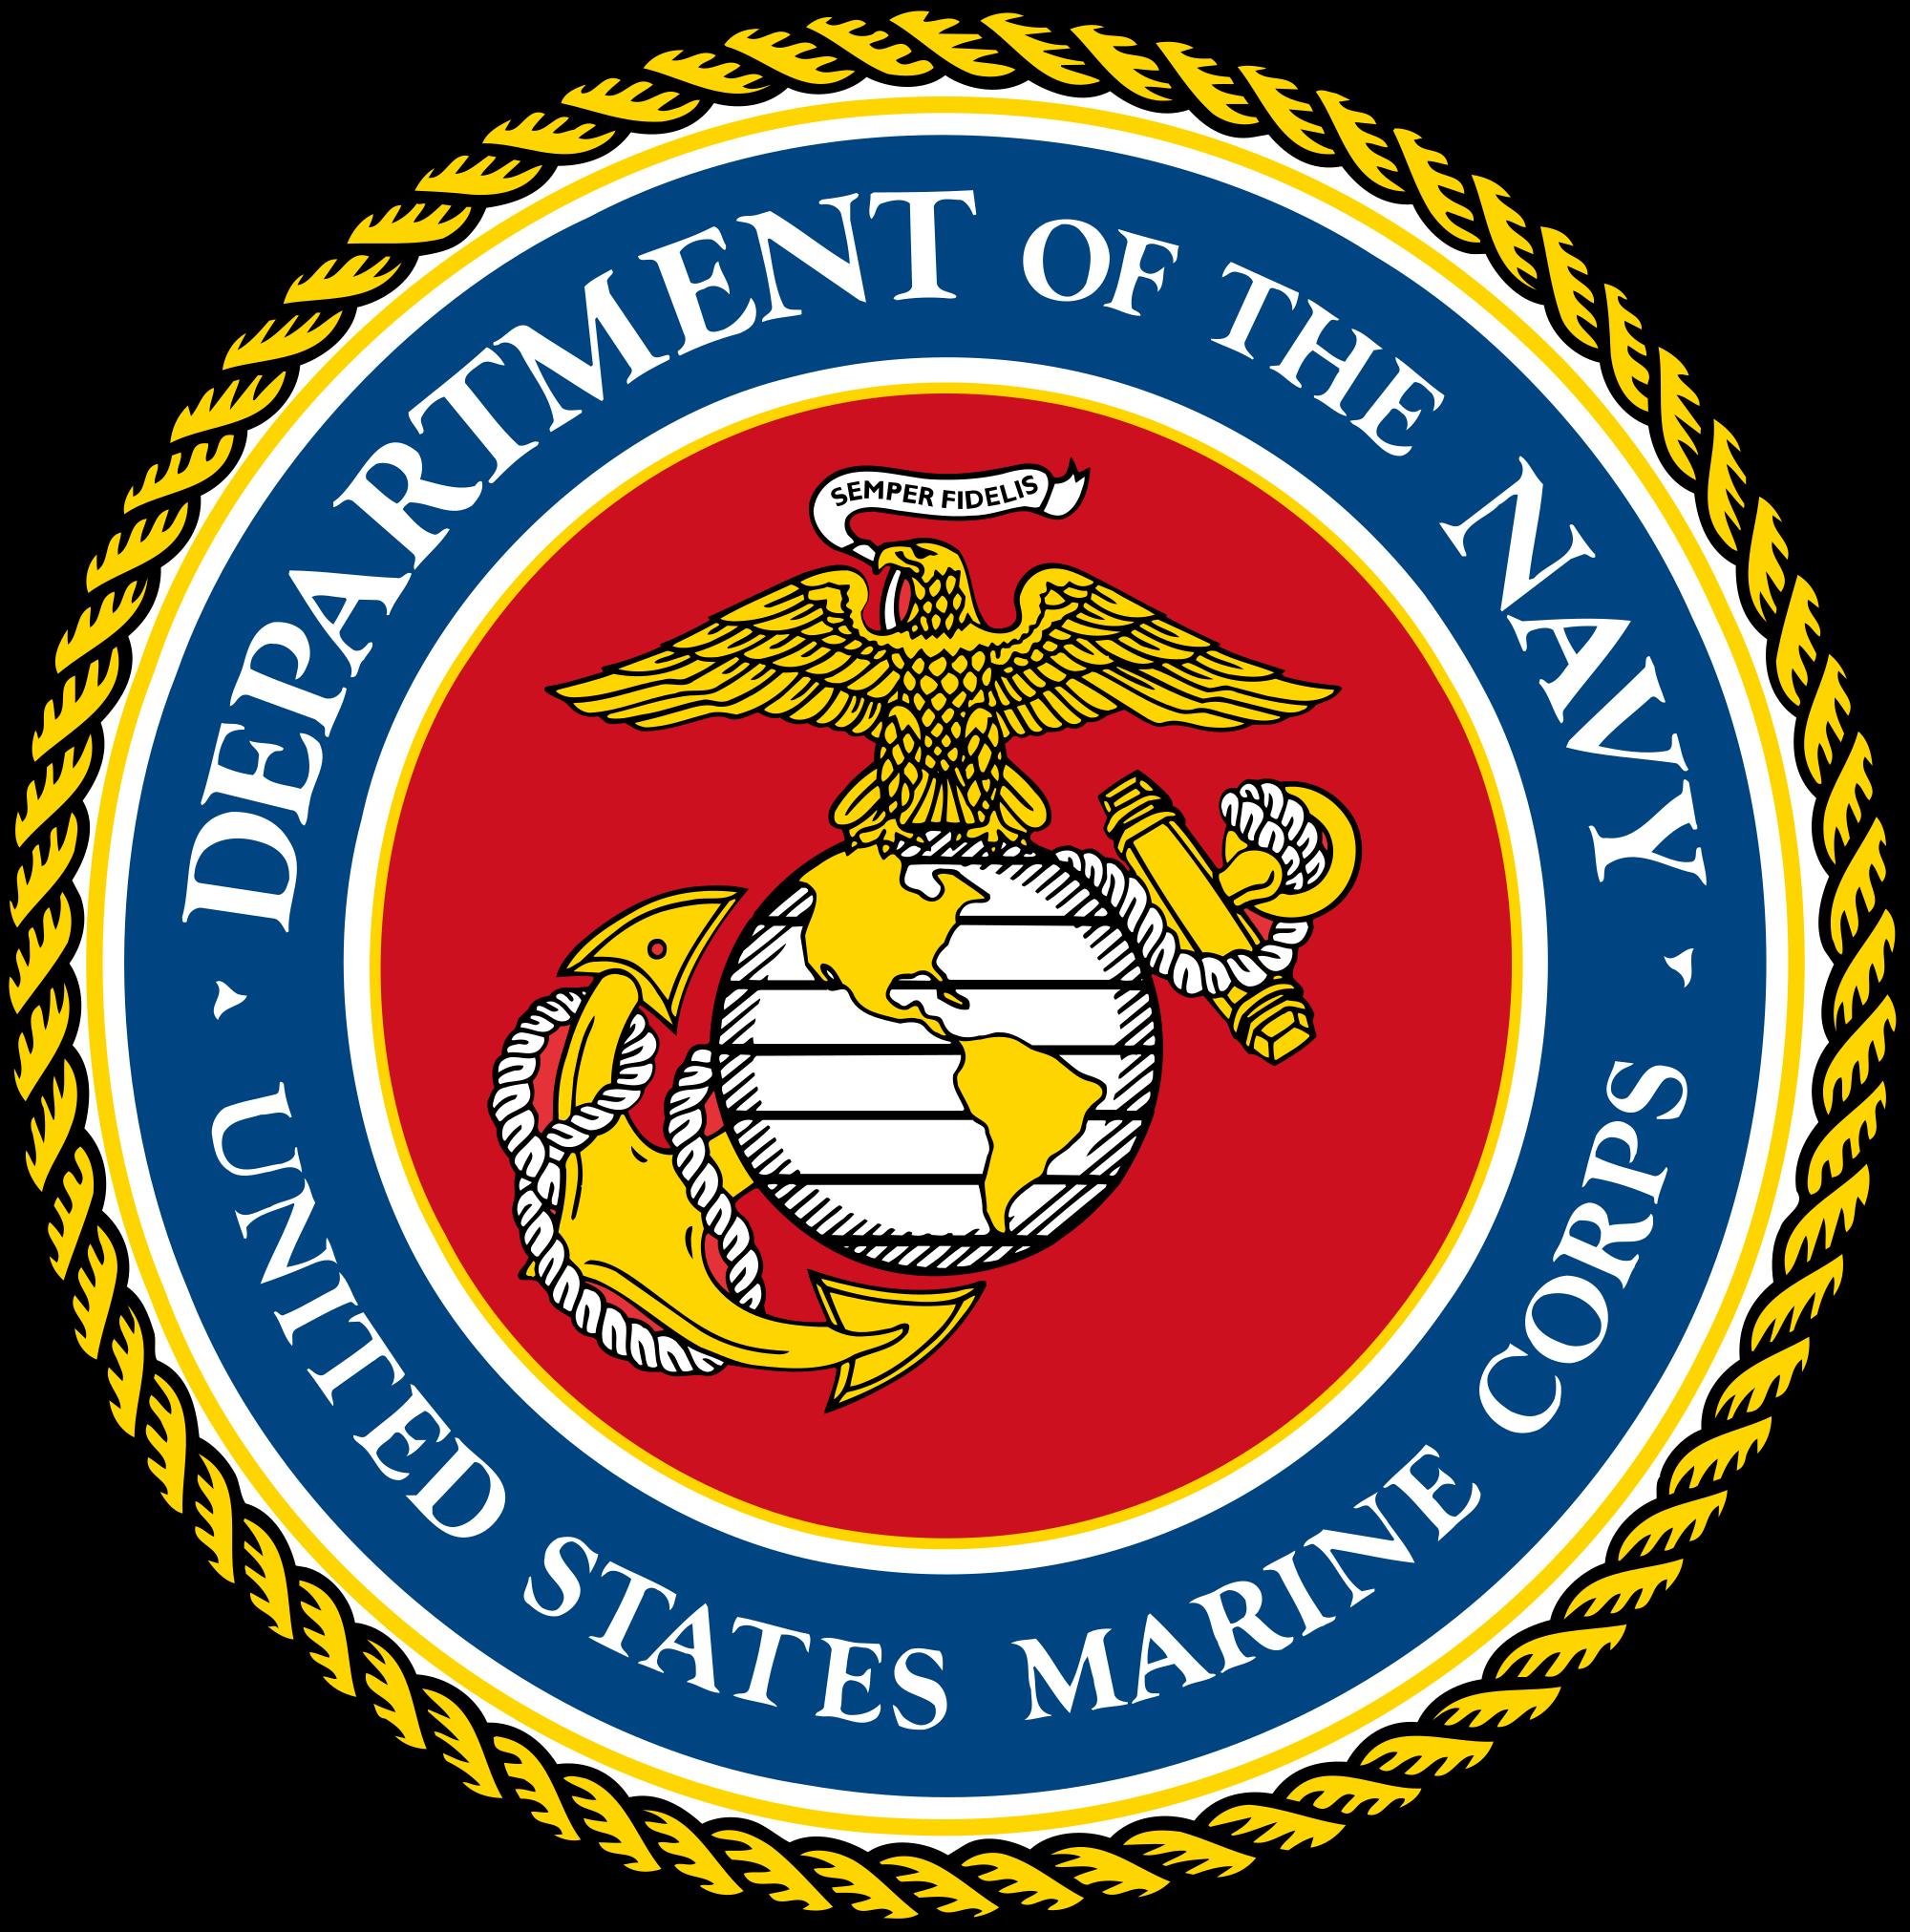 Red Team Company, Washington, D C  | Red 6